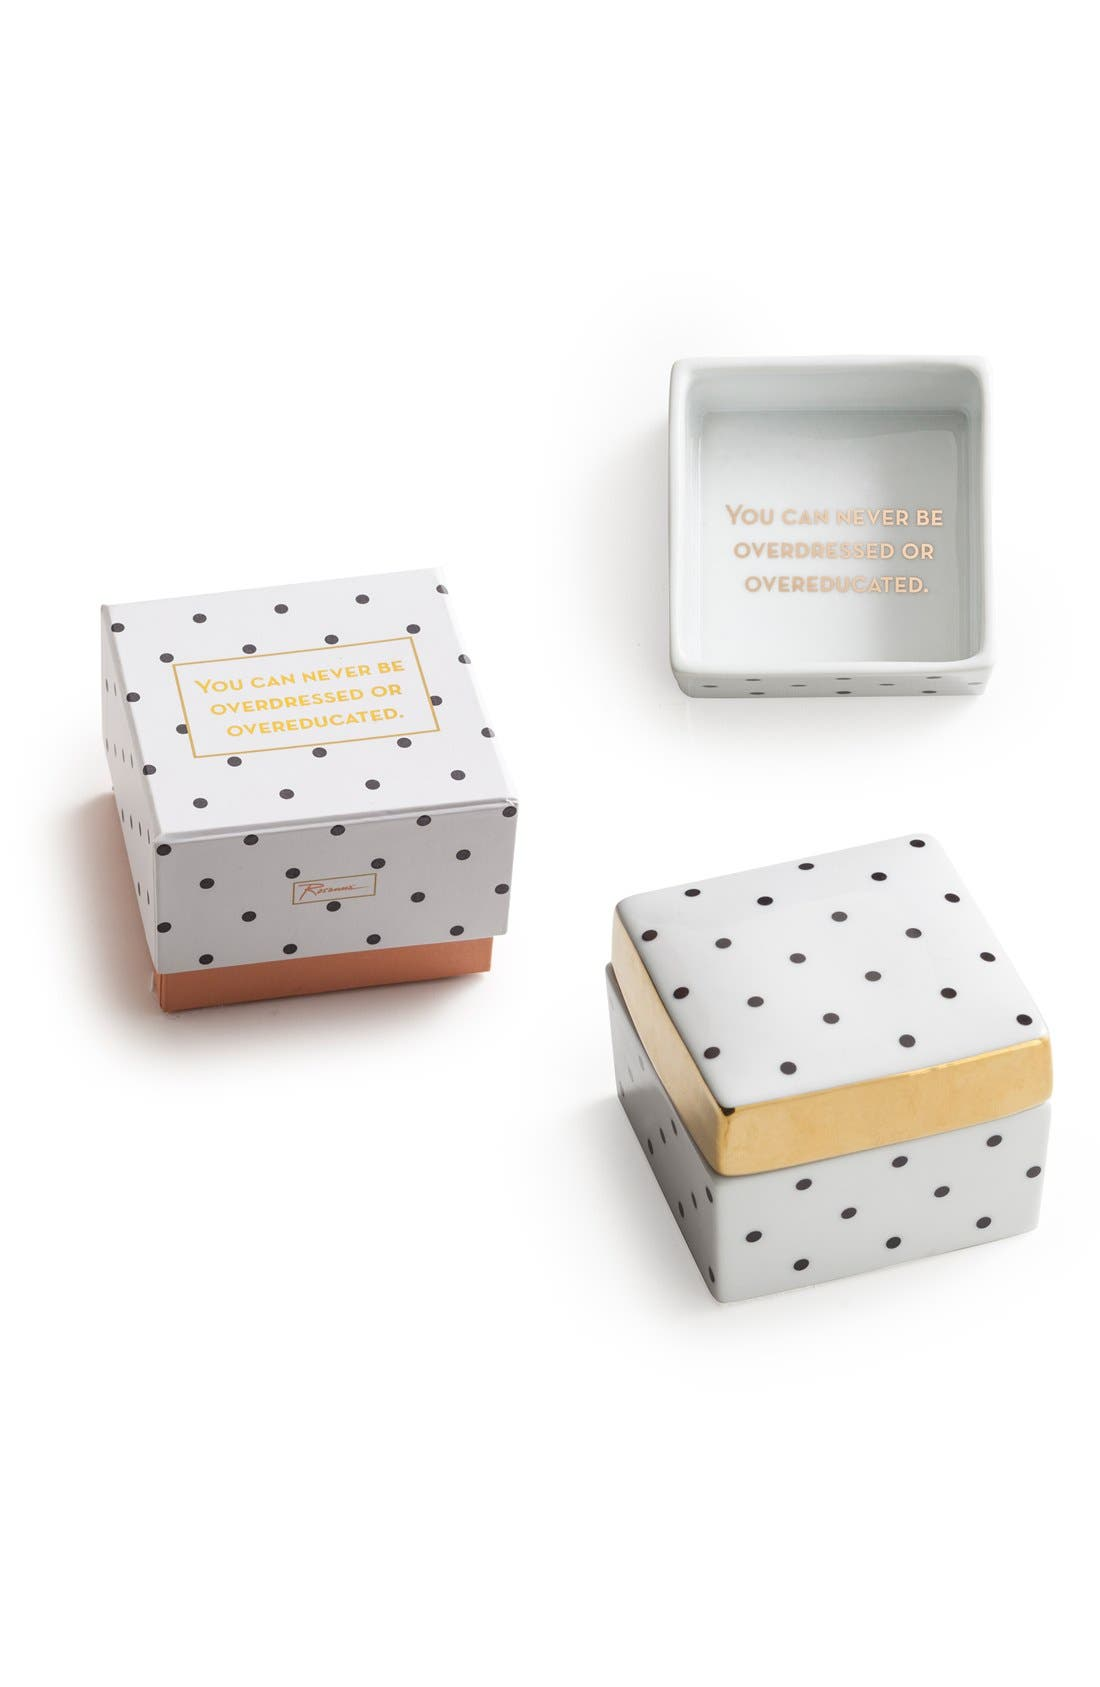 Main Image - Rosanna 'Overdressed or Overeducated' Porcelain Trinket Box